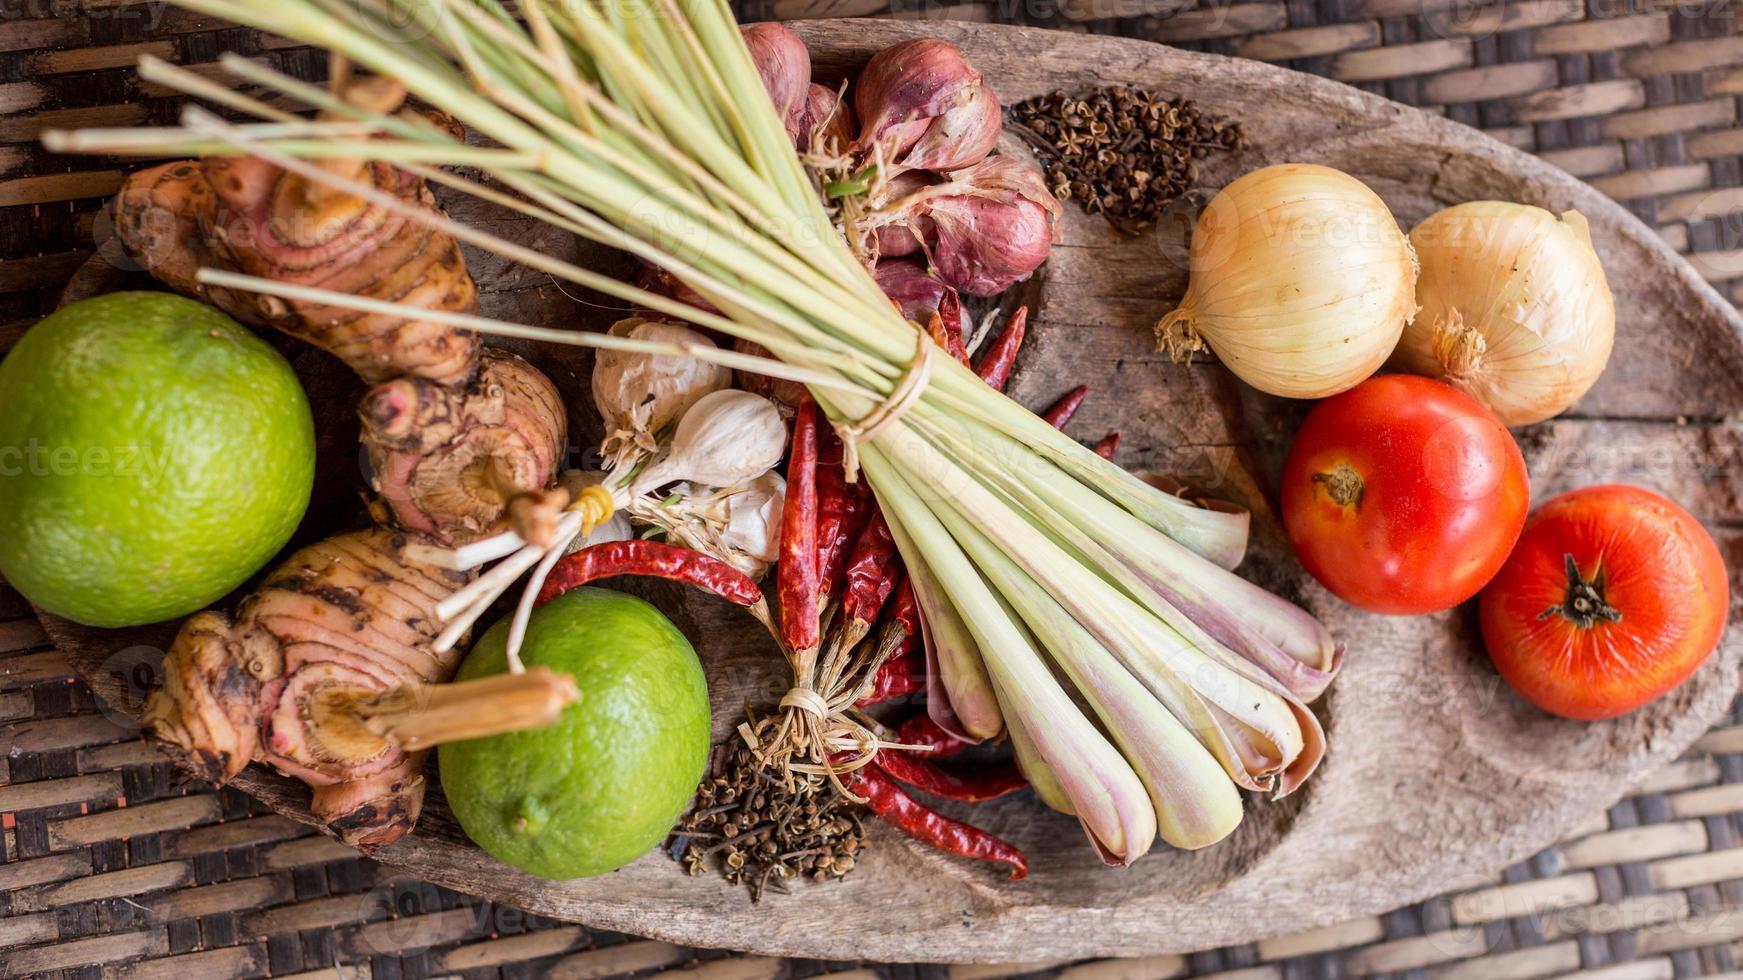 ingrediente alimentare tailandese foto